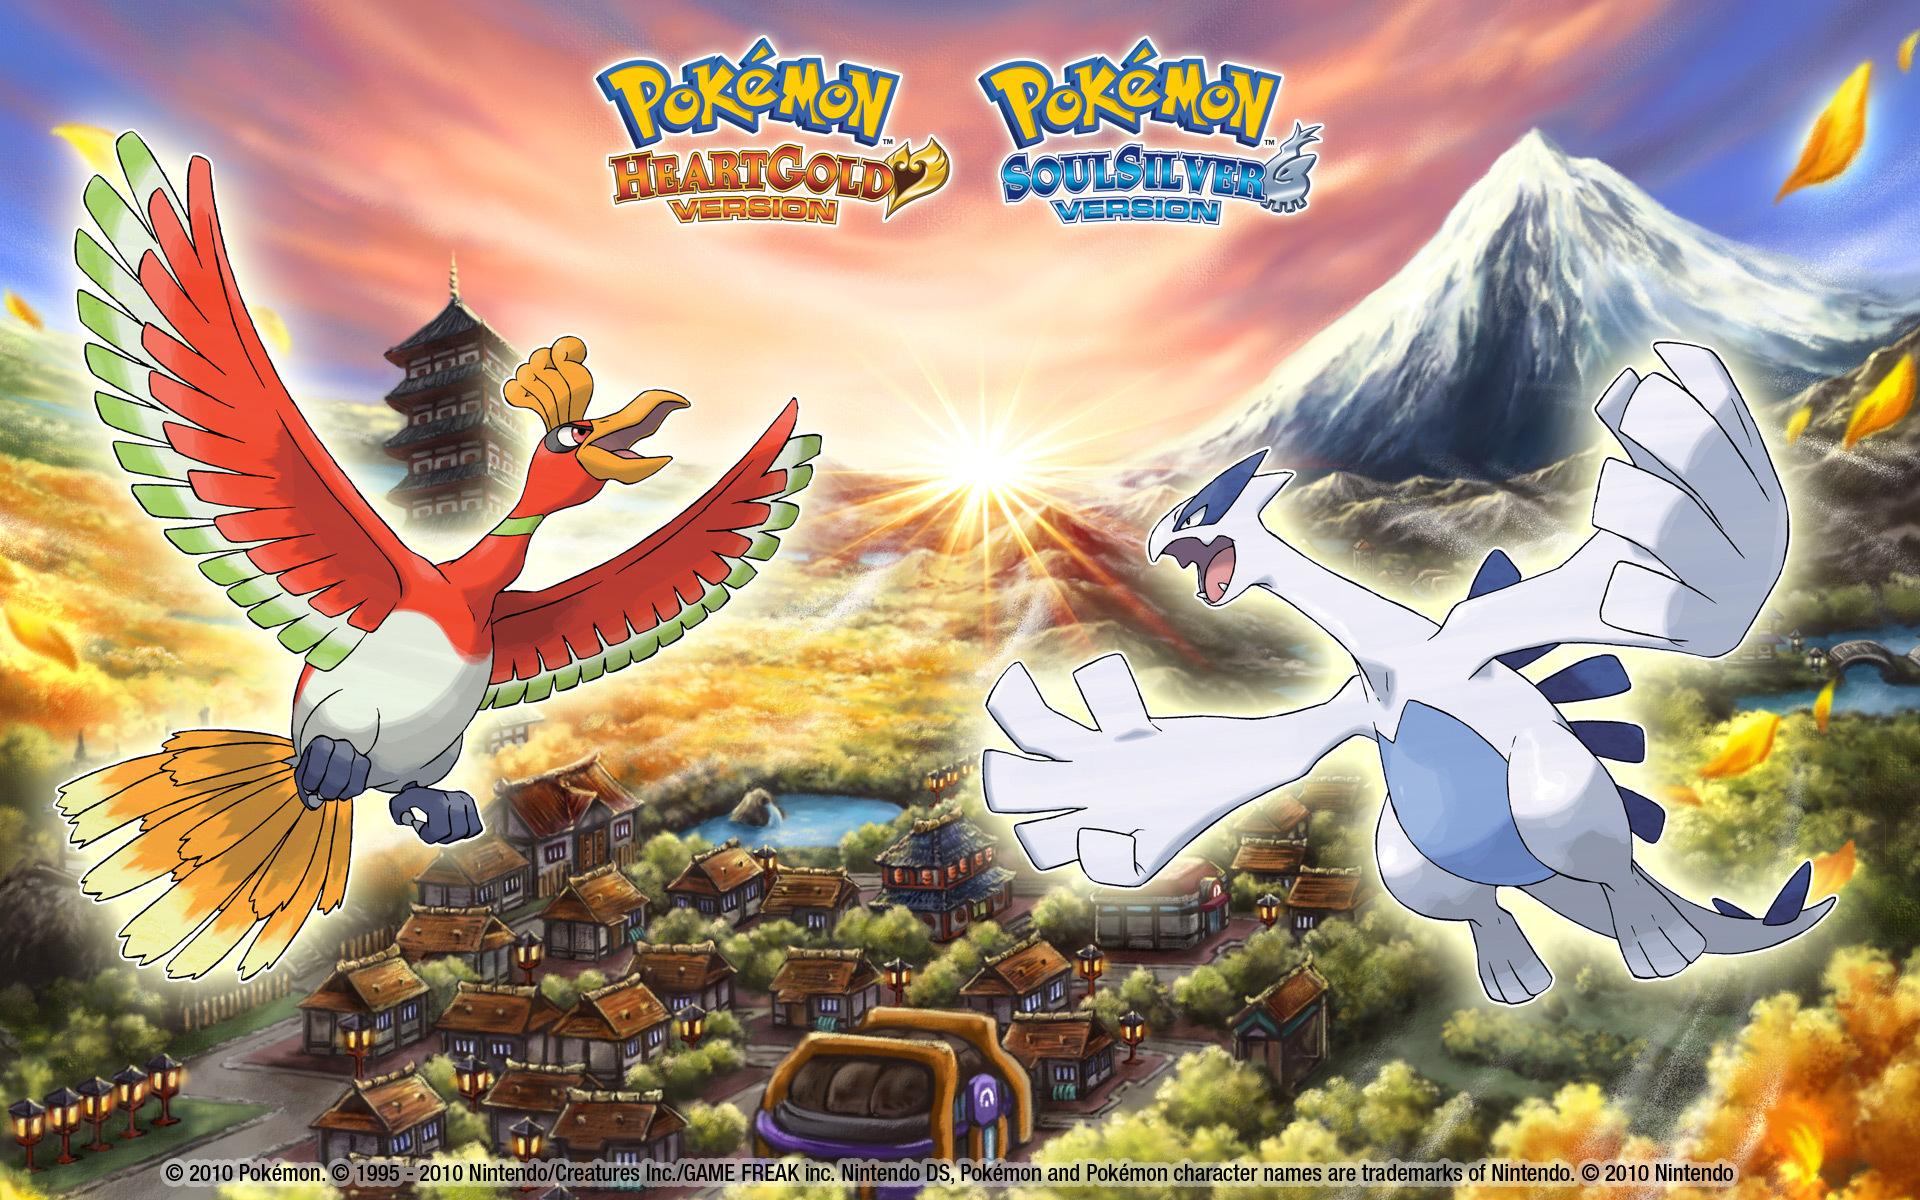 Pokemon Soulsilver images HGSS Wallpaper wallpaper photos 15728618 1920x1200